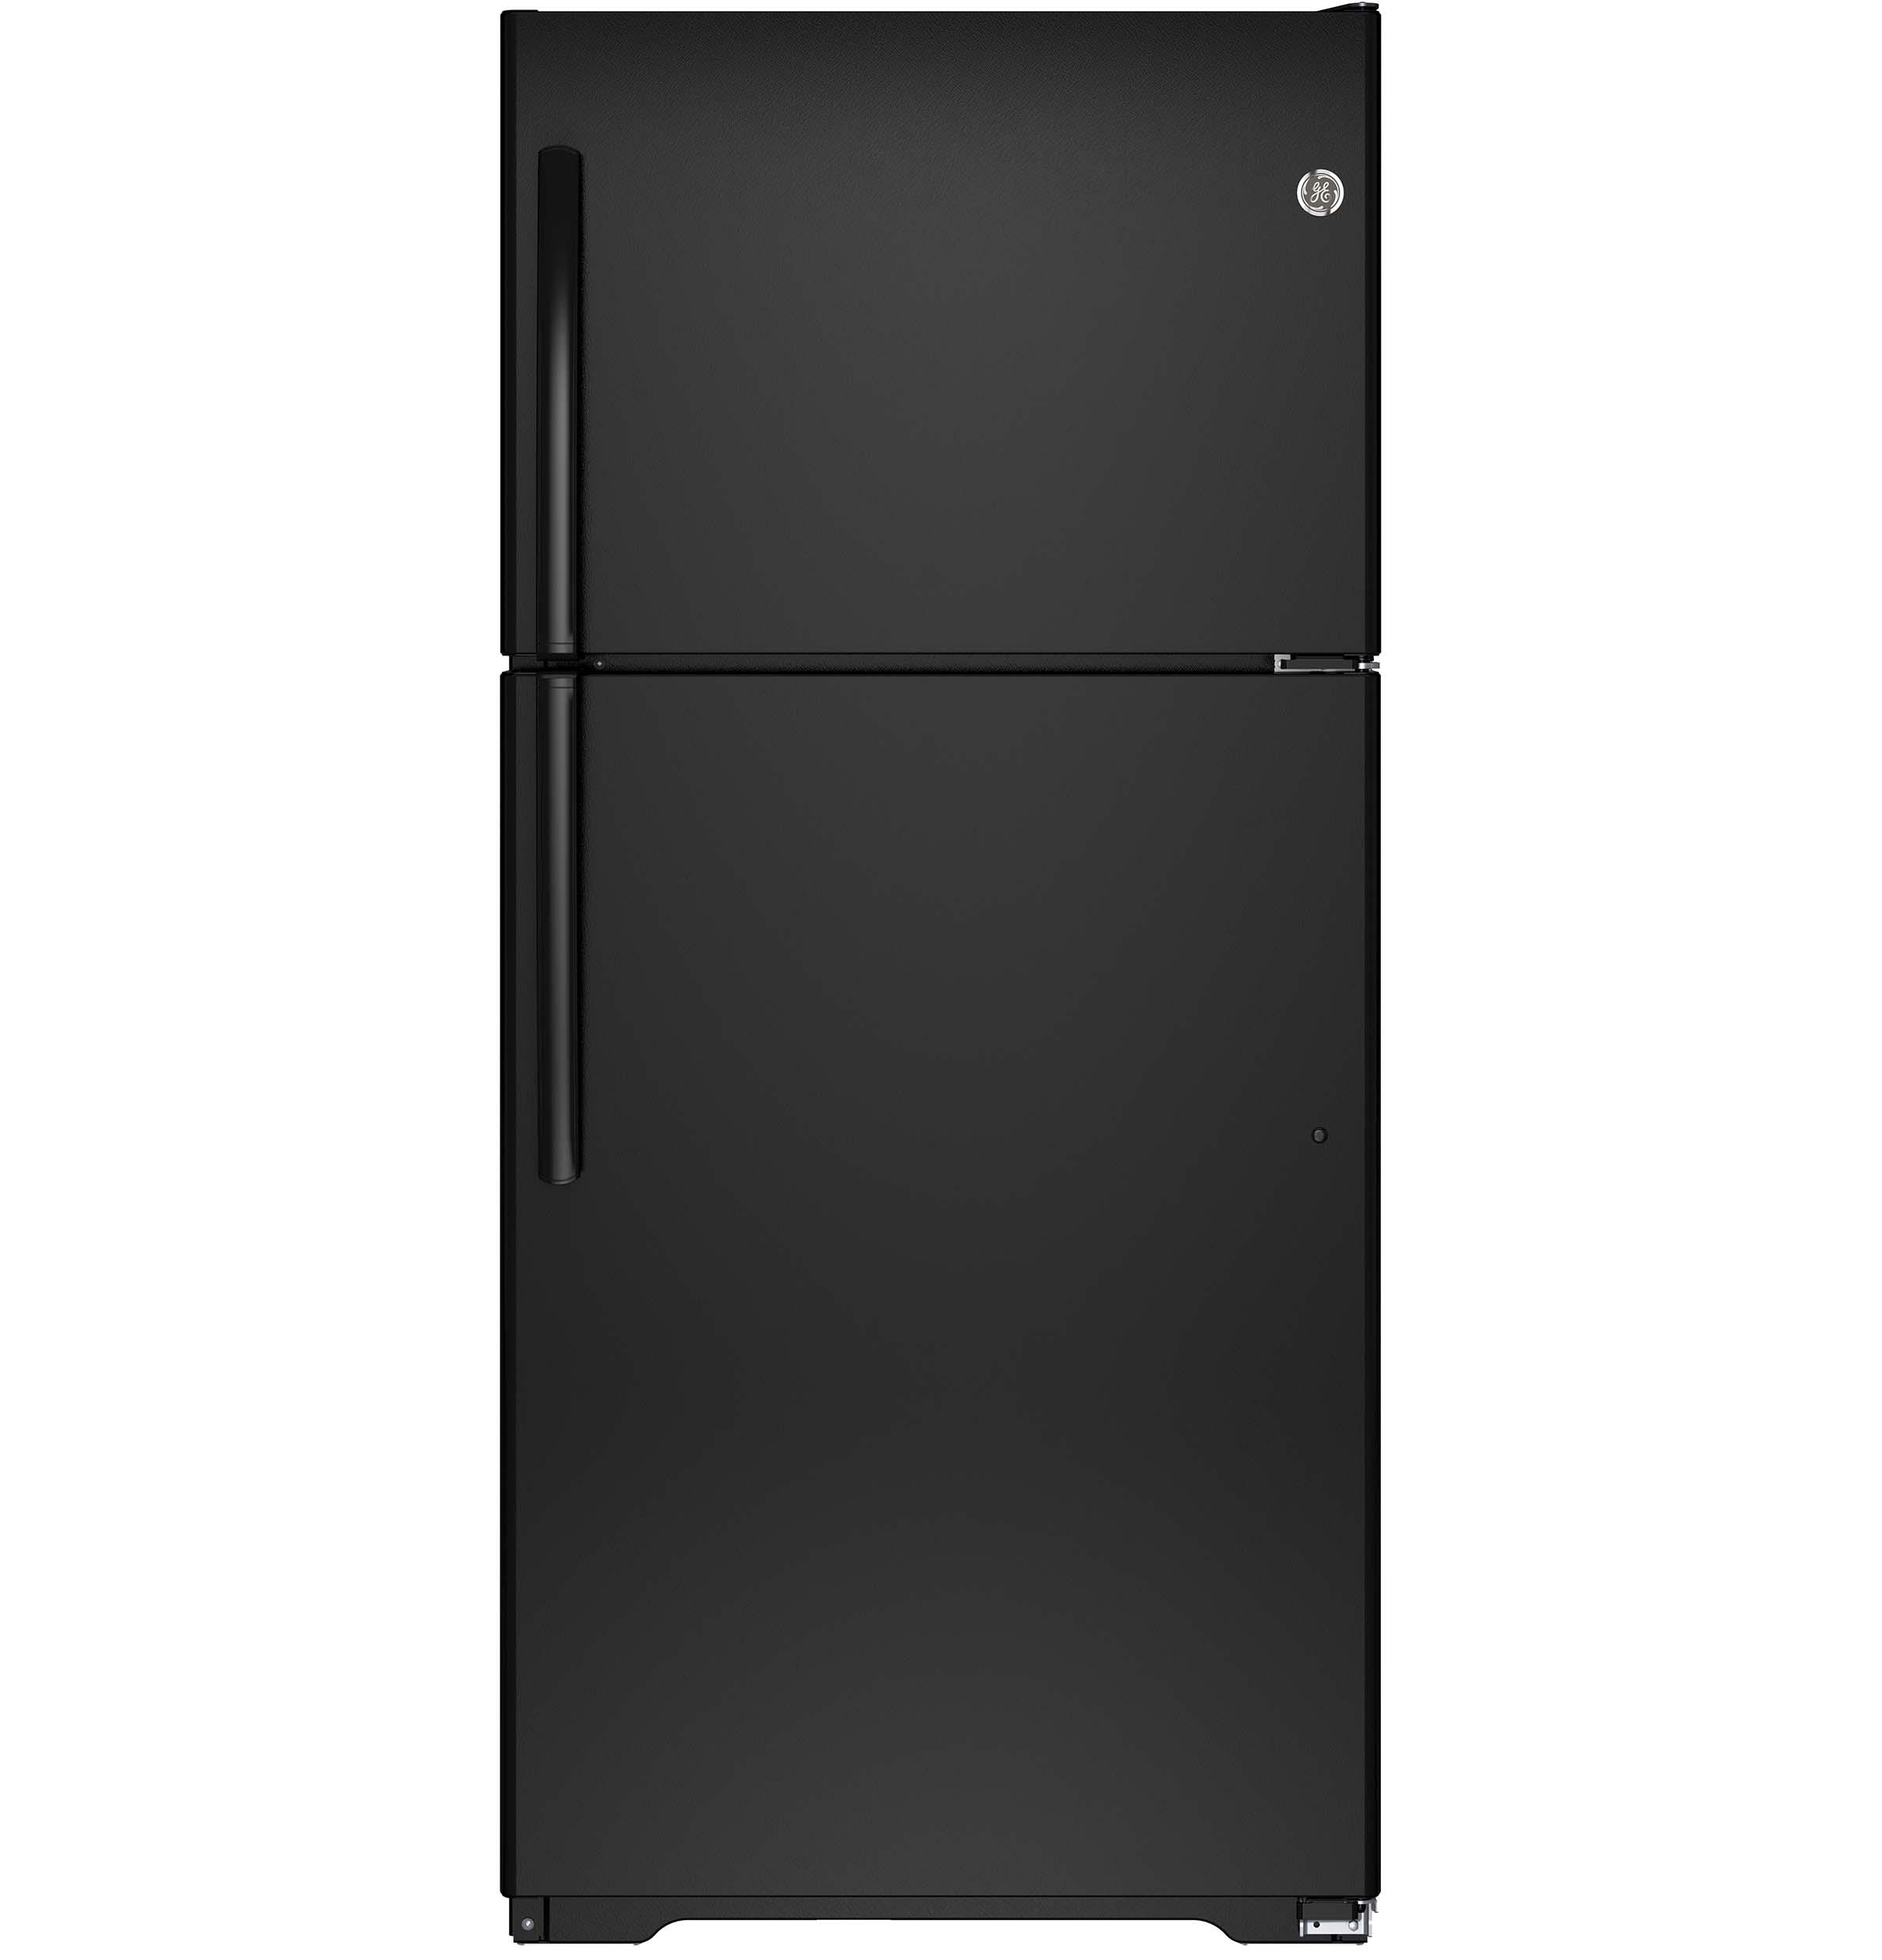 GE GE® ENERGY STAR® 18.2 Cu. Ft. Top-Freezer Refrigerator